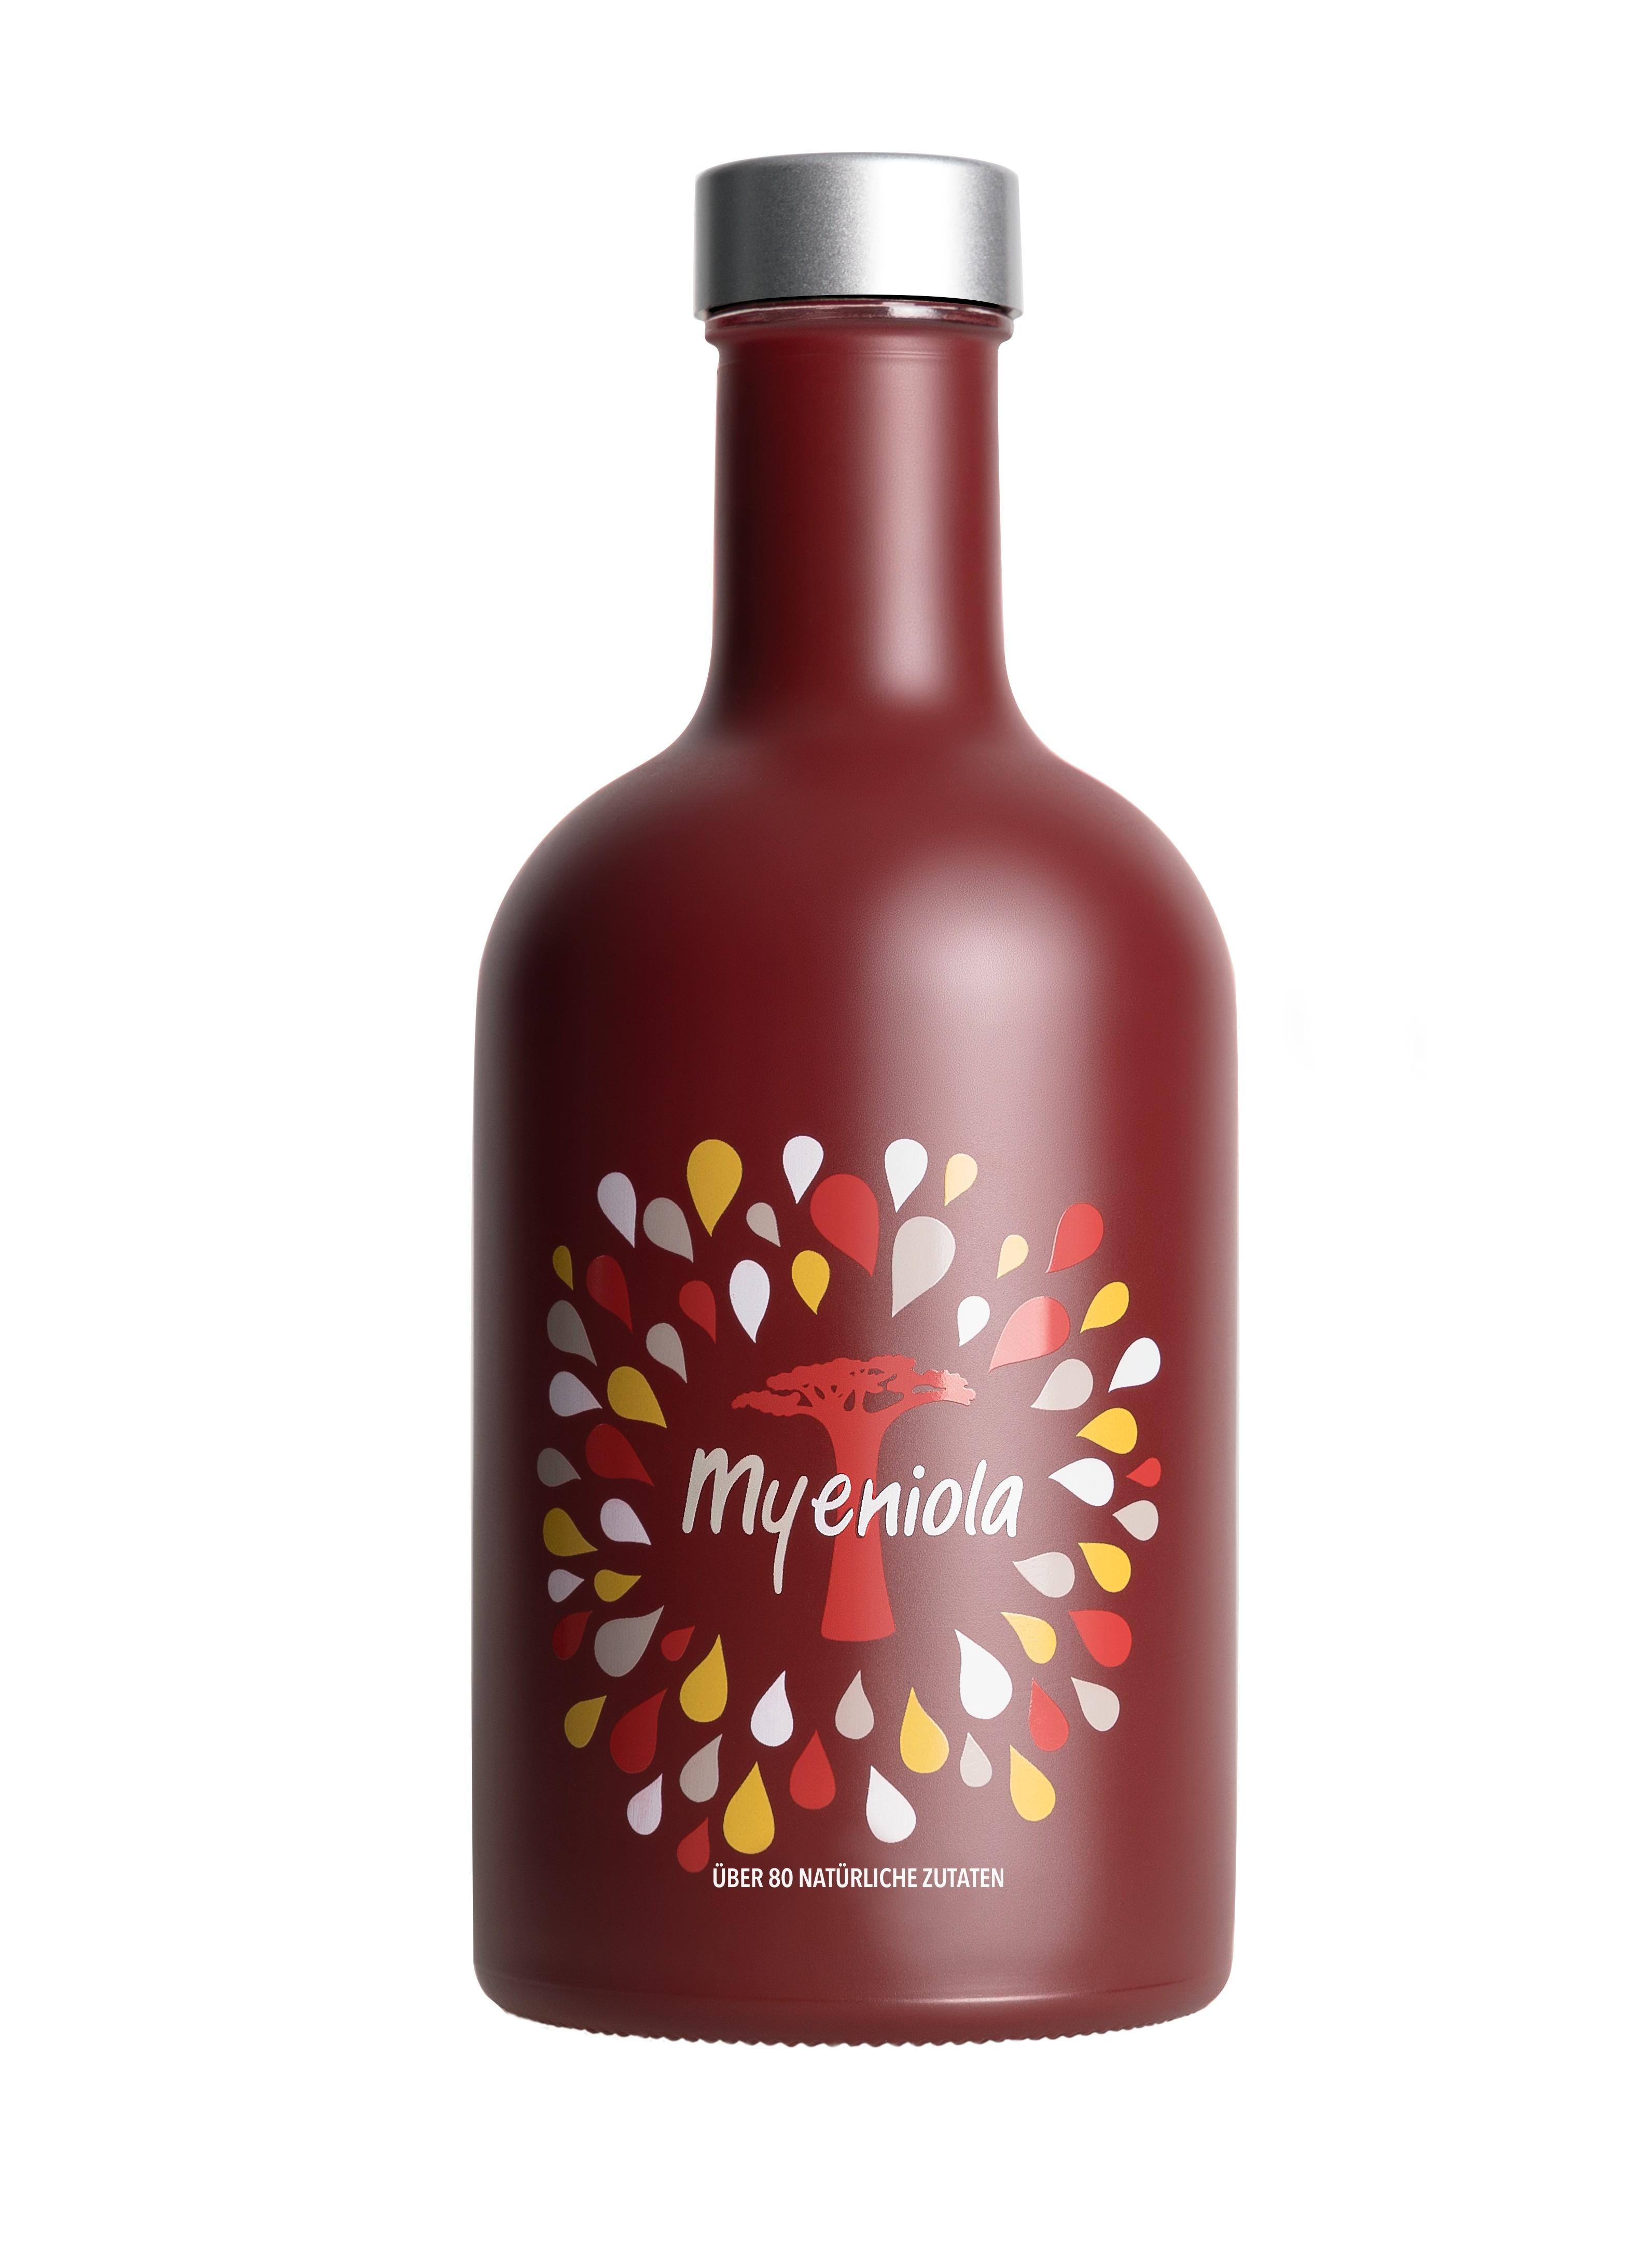 Myeniola - 3 Flaschen a 500ml Kur